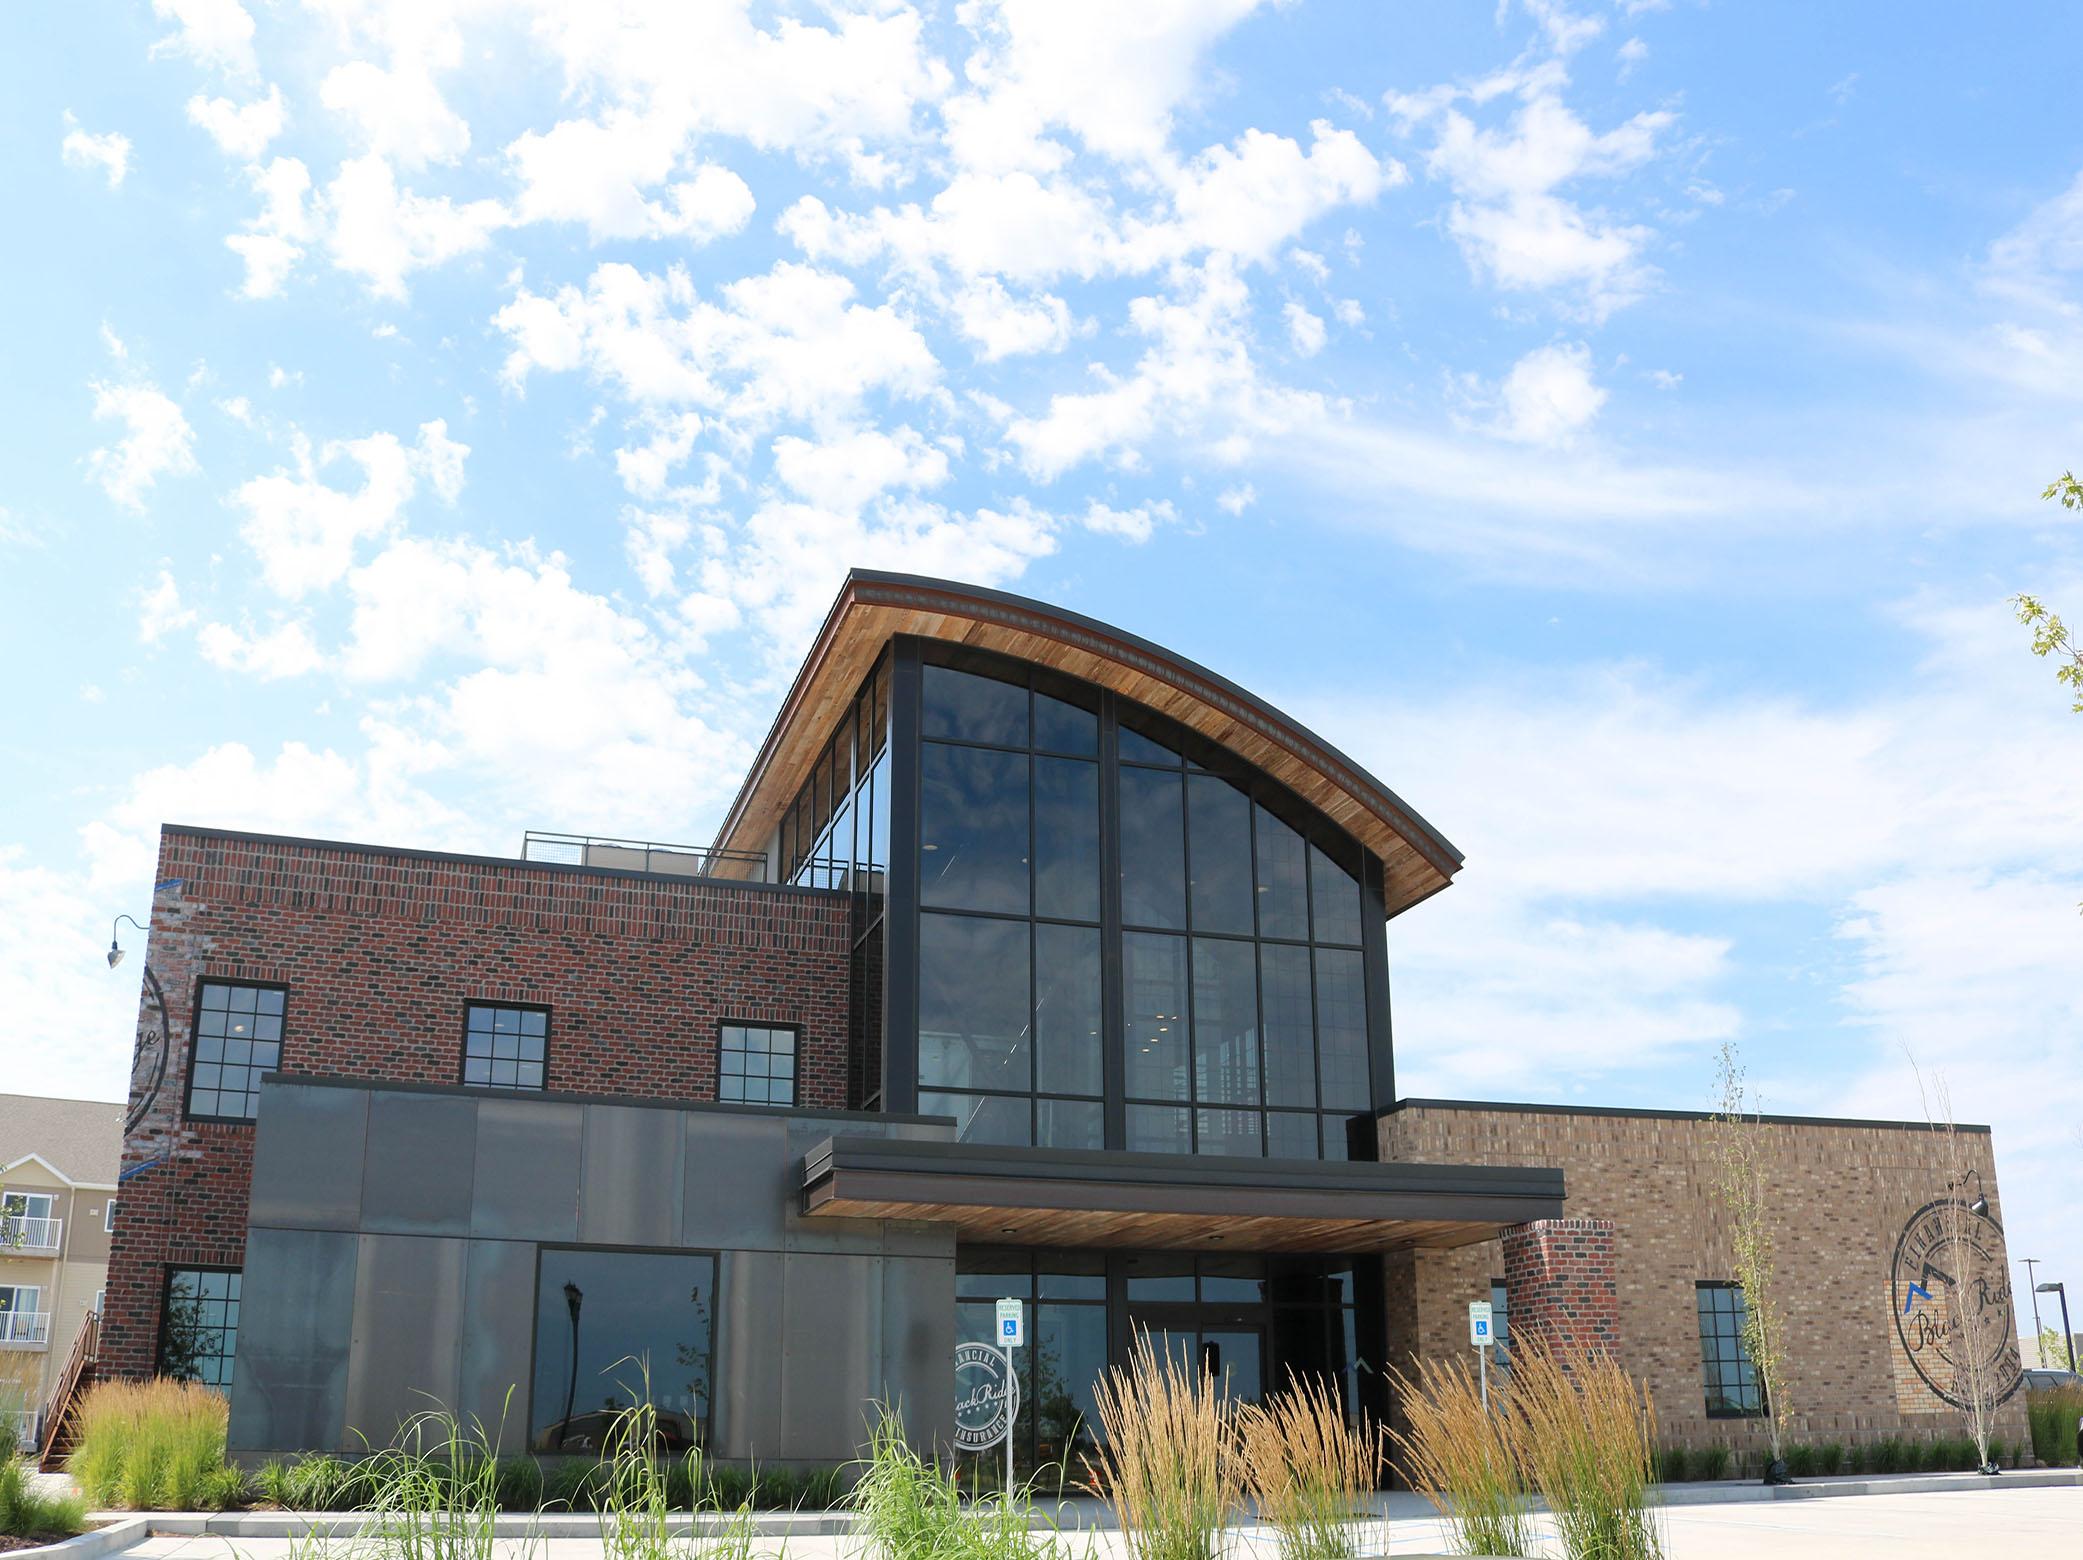 Tecta America Dakotas commercial roofing in North Dakota, BlackRidge Financial Group